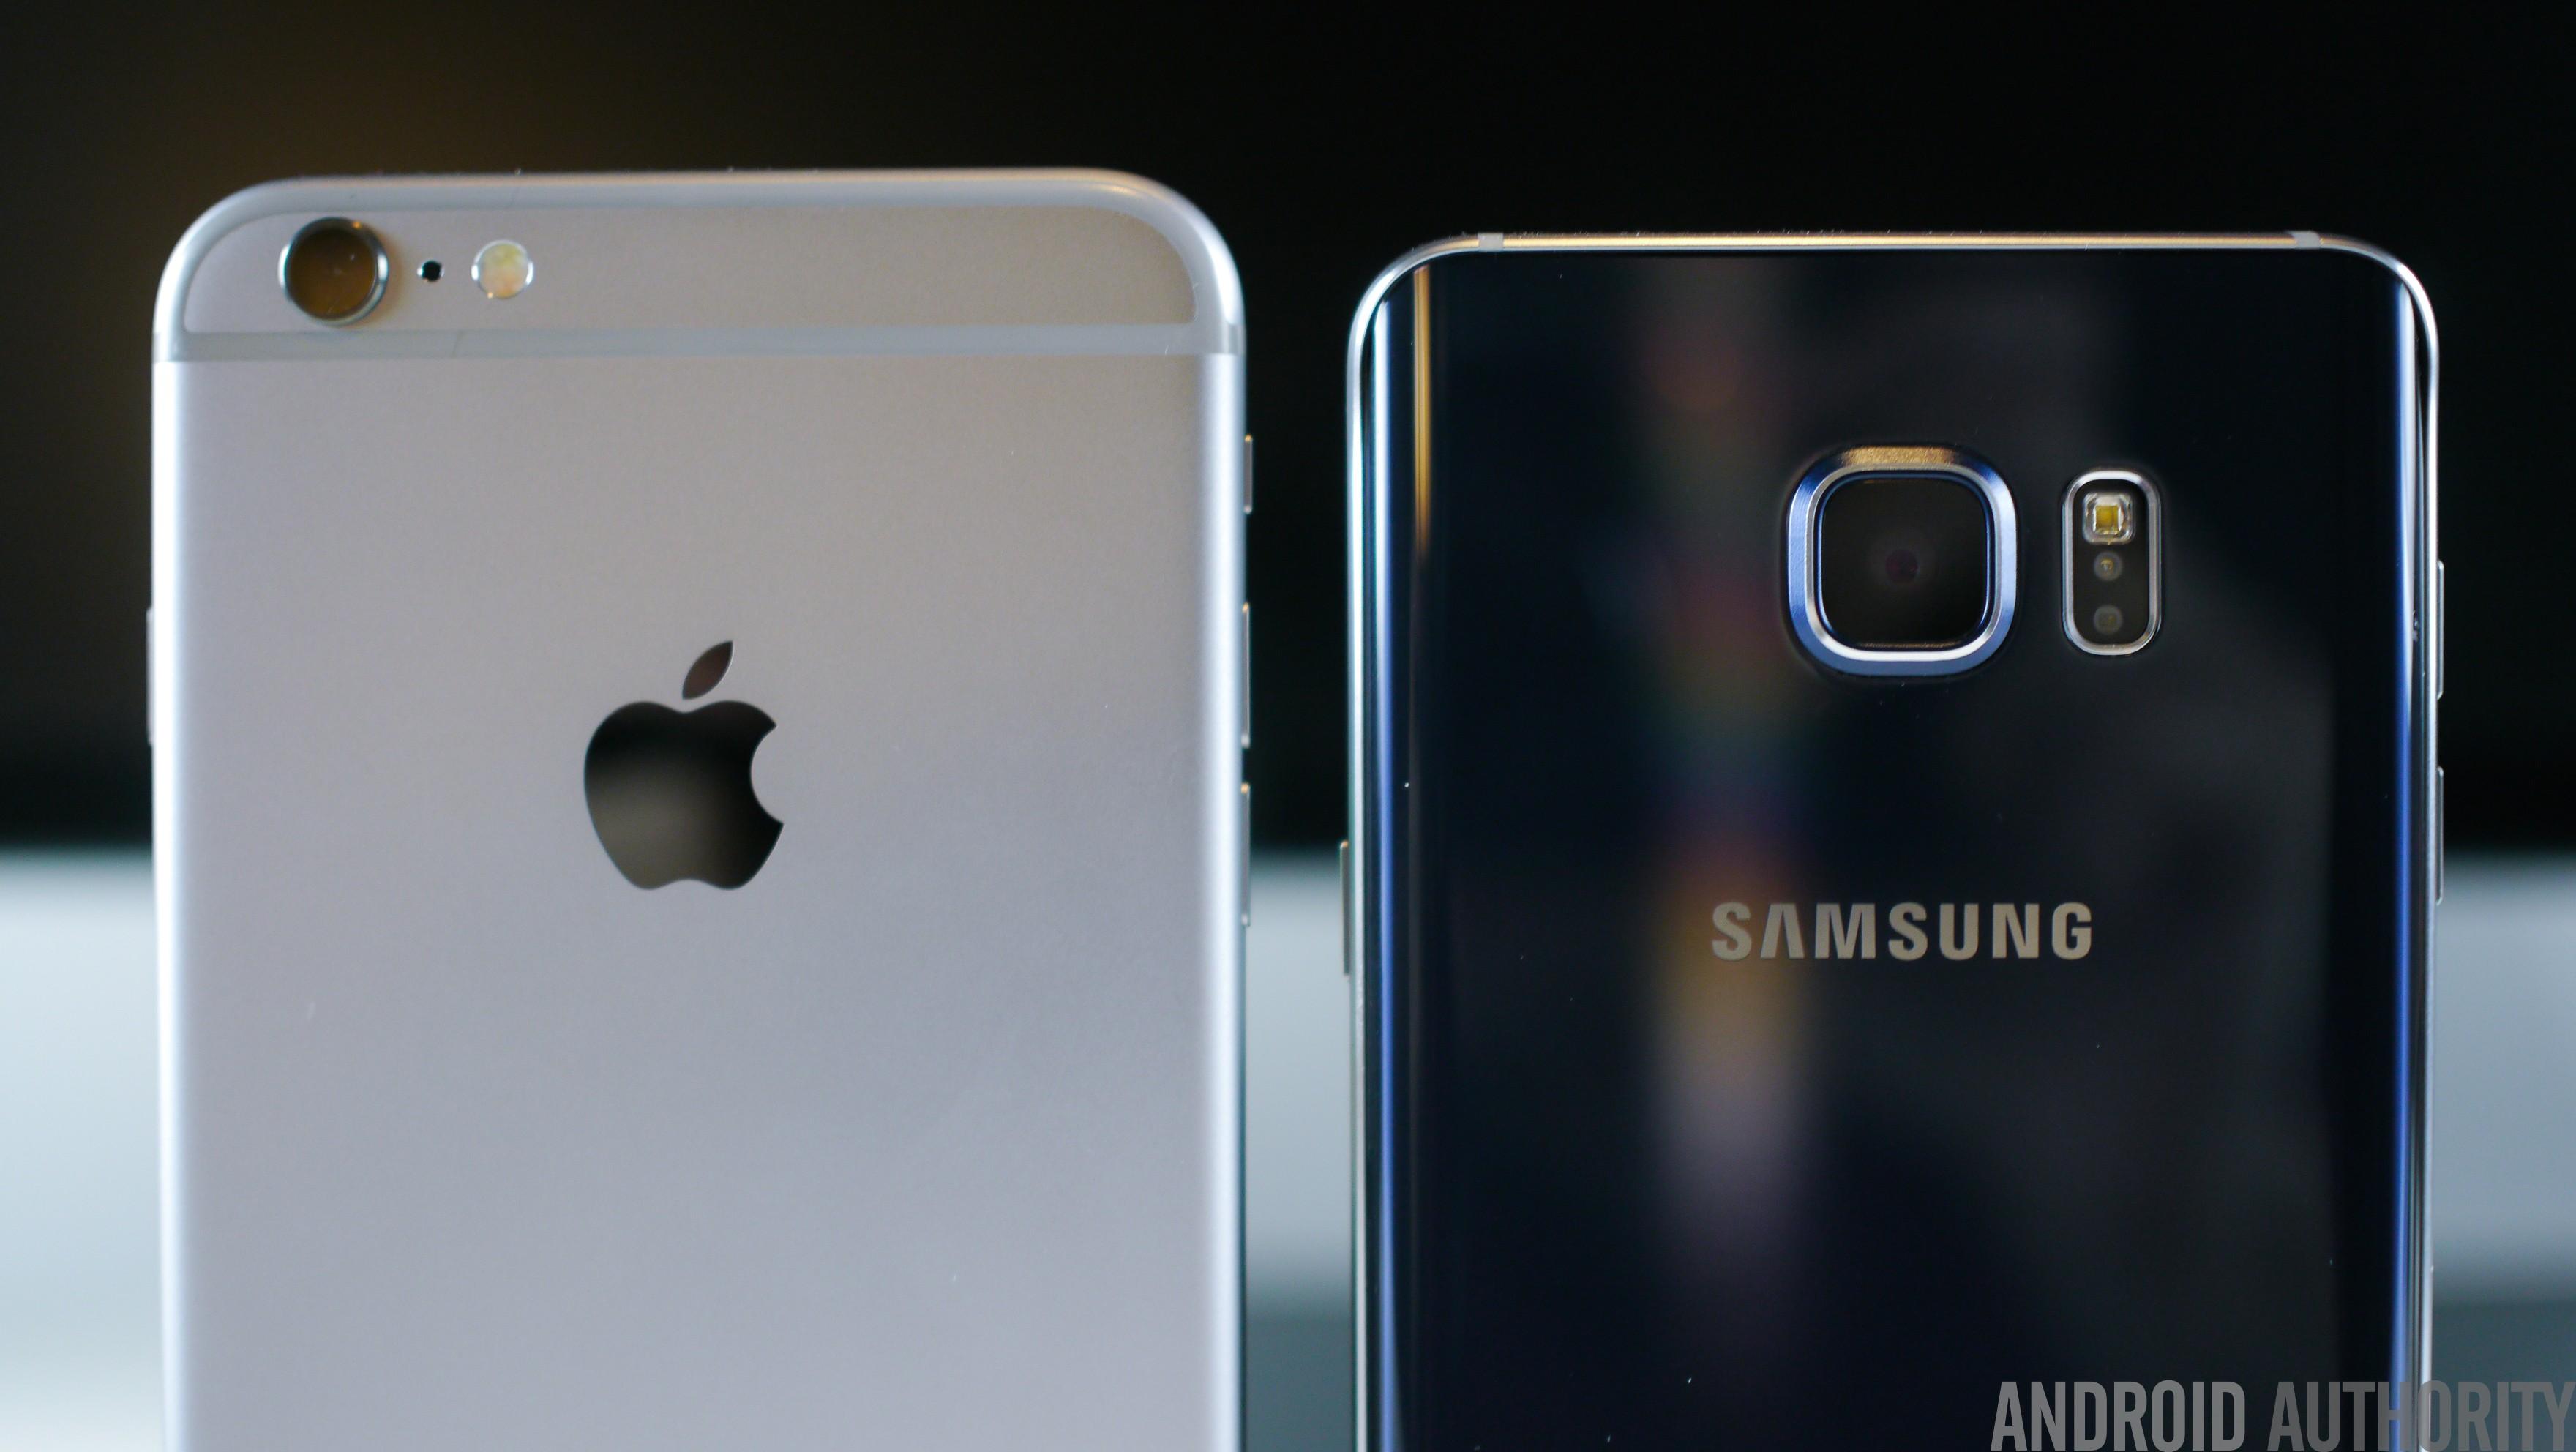 samsung-galaxy-note-5-vs-iphone-6s-plus-12